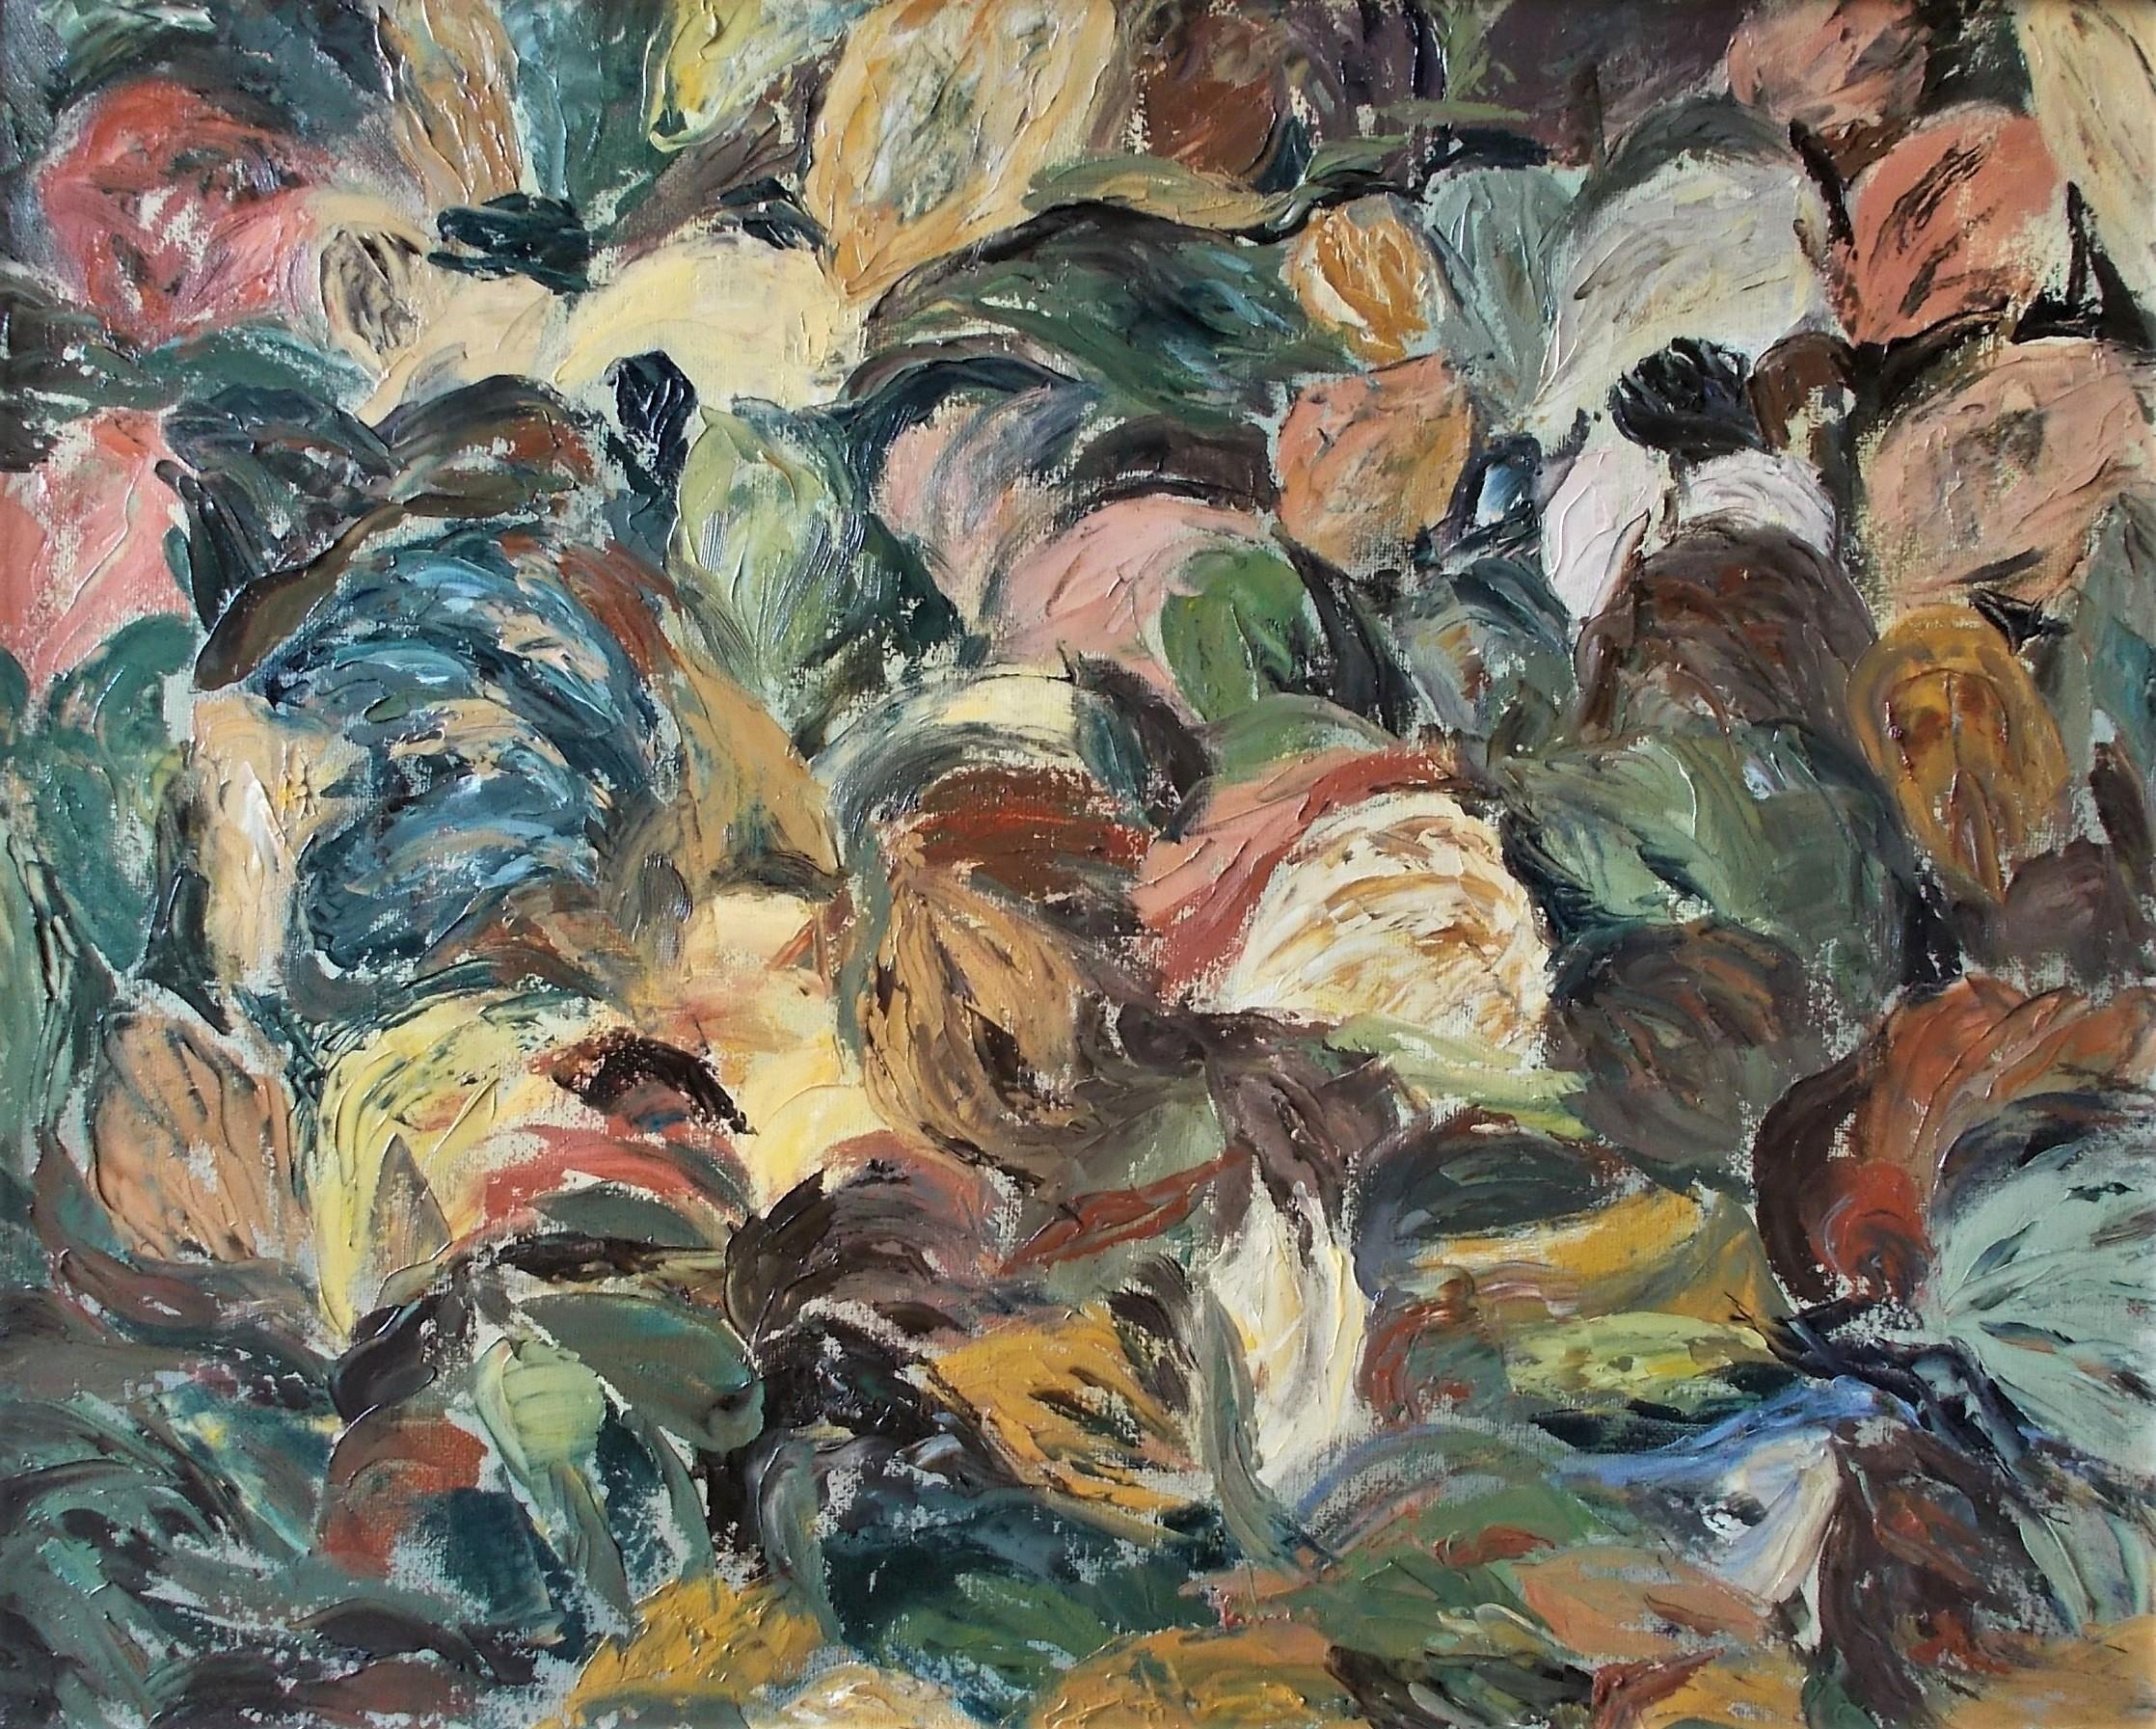 20496926-LiviaStanciu_Tapestry_Painting_16x20_450.jpg